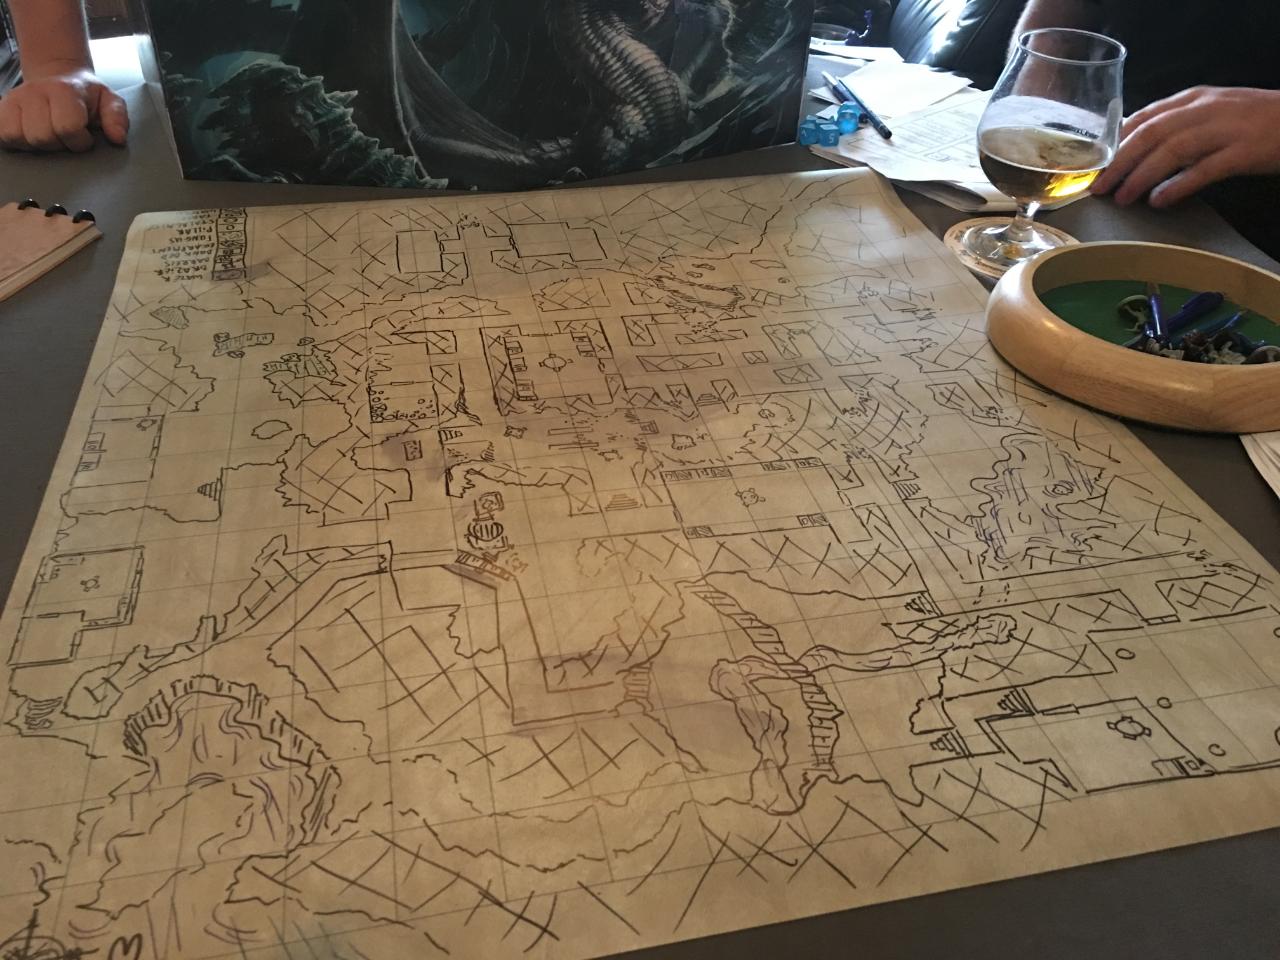 Hand-drawn map